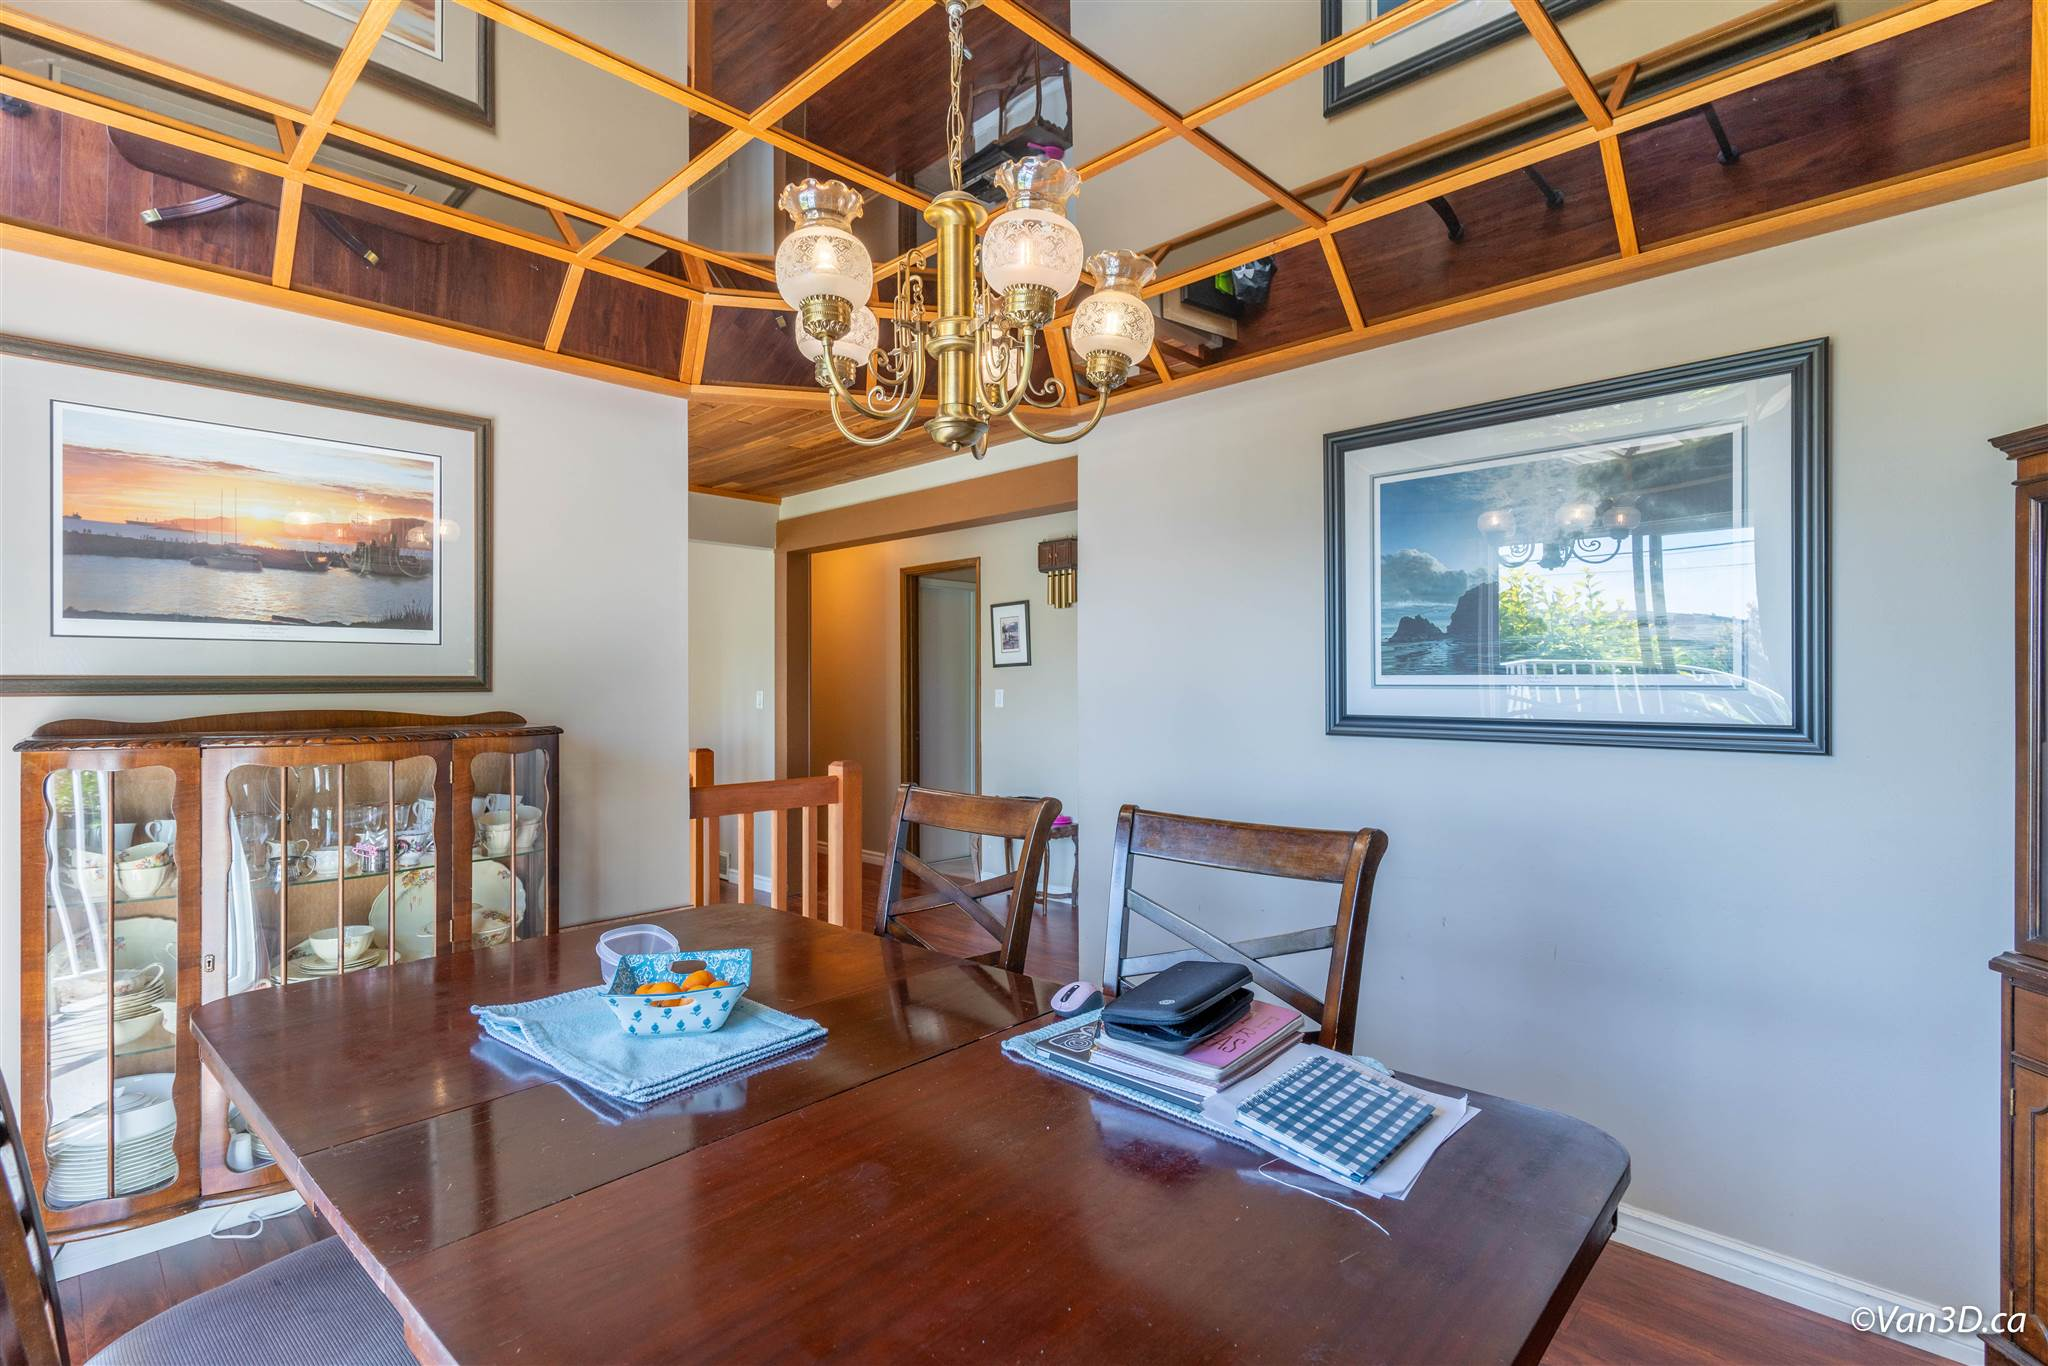 14495 MANN PARK CRESCENT - White Rock House/Single Family for sale, 4 Bedrooms (R2604561) - #23